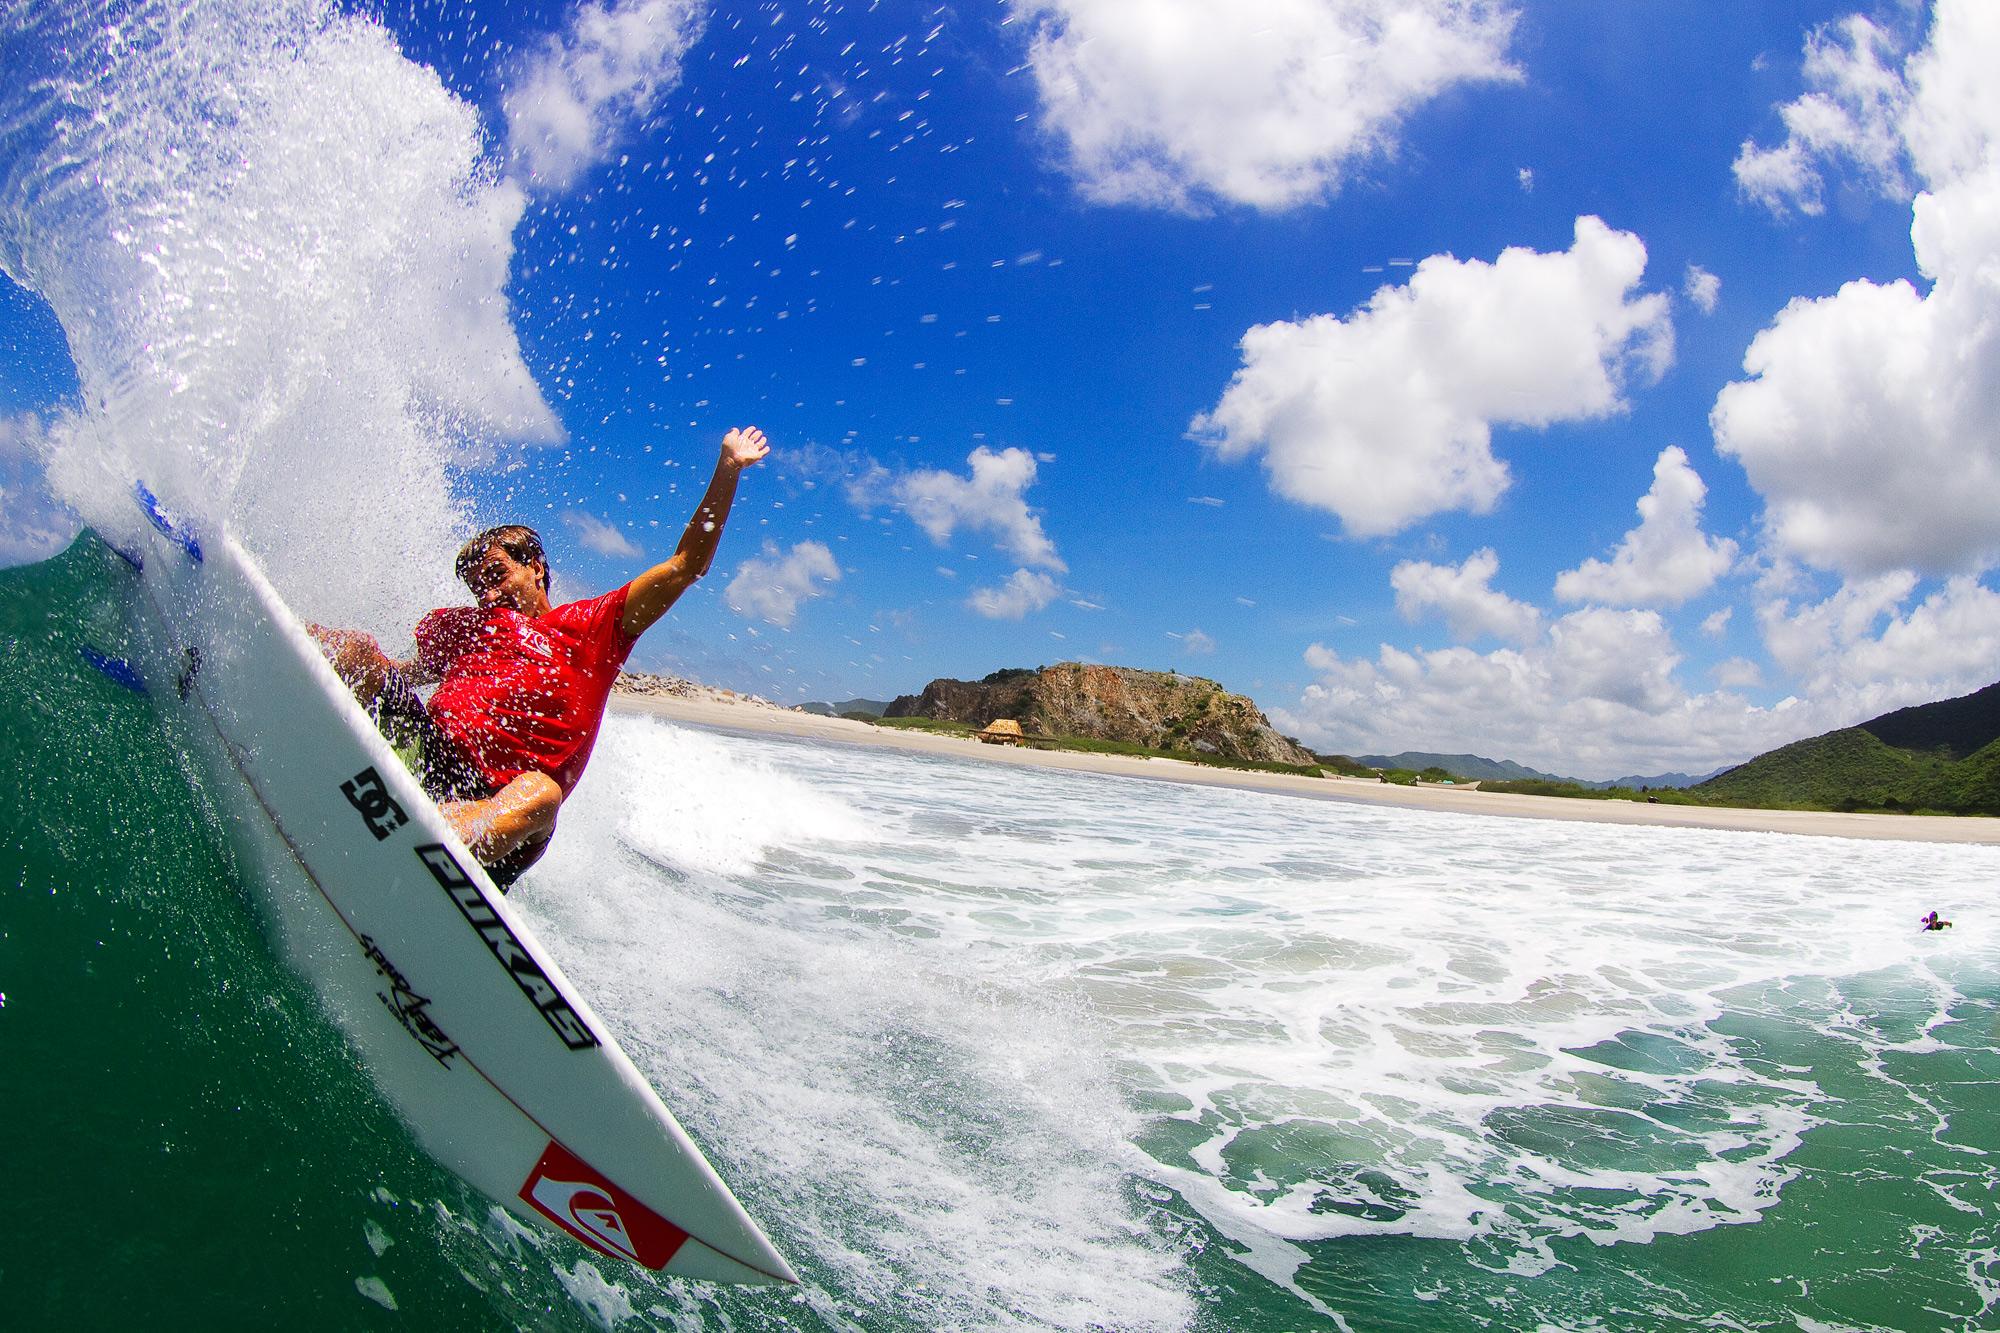 Circuito Mundial De Surf : Aritz aranburu en el circuito mundial de surf escuela de surf las